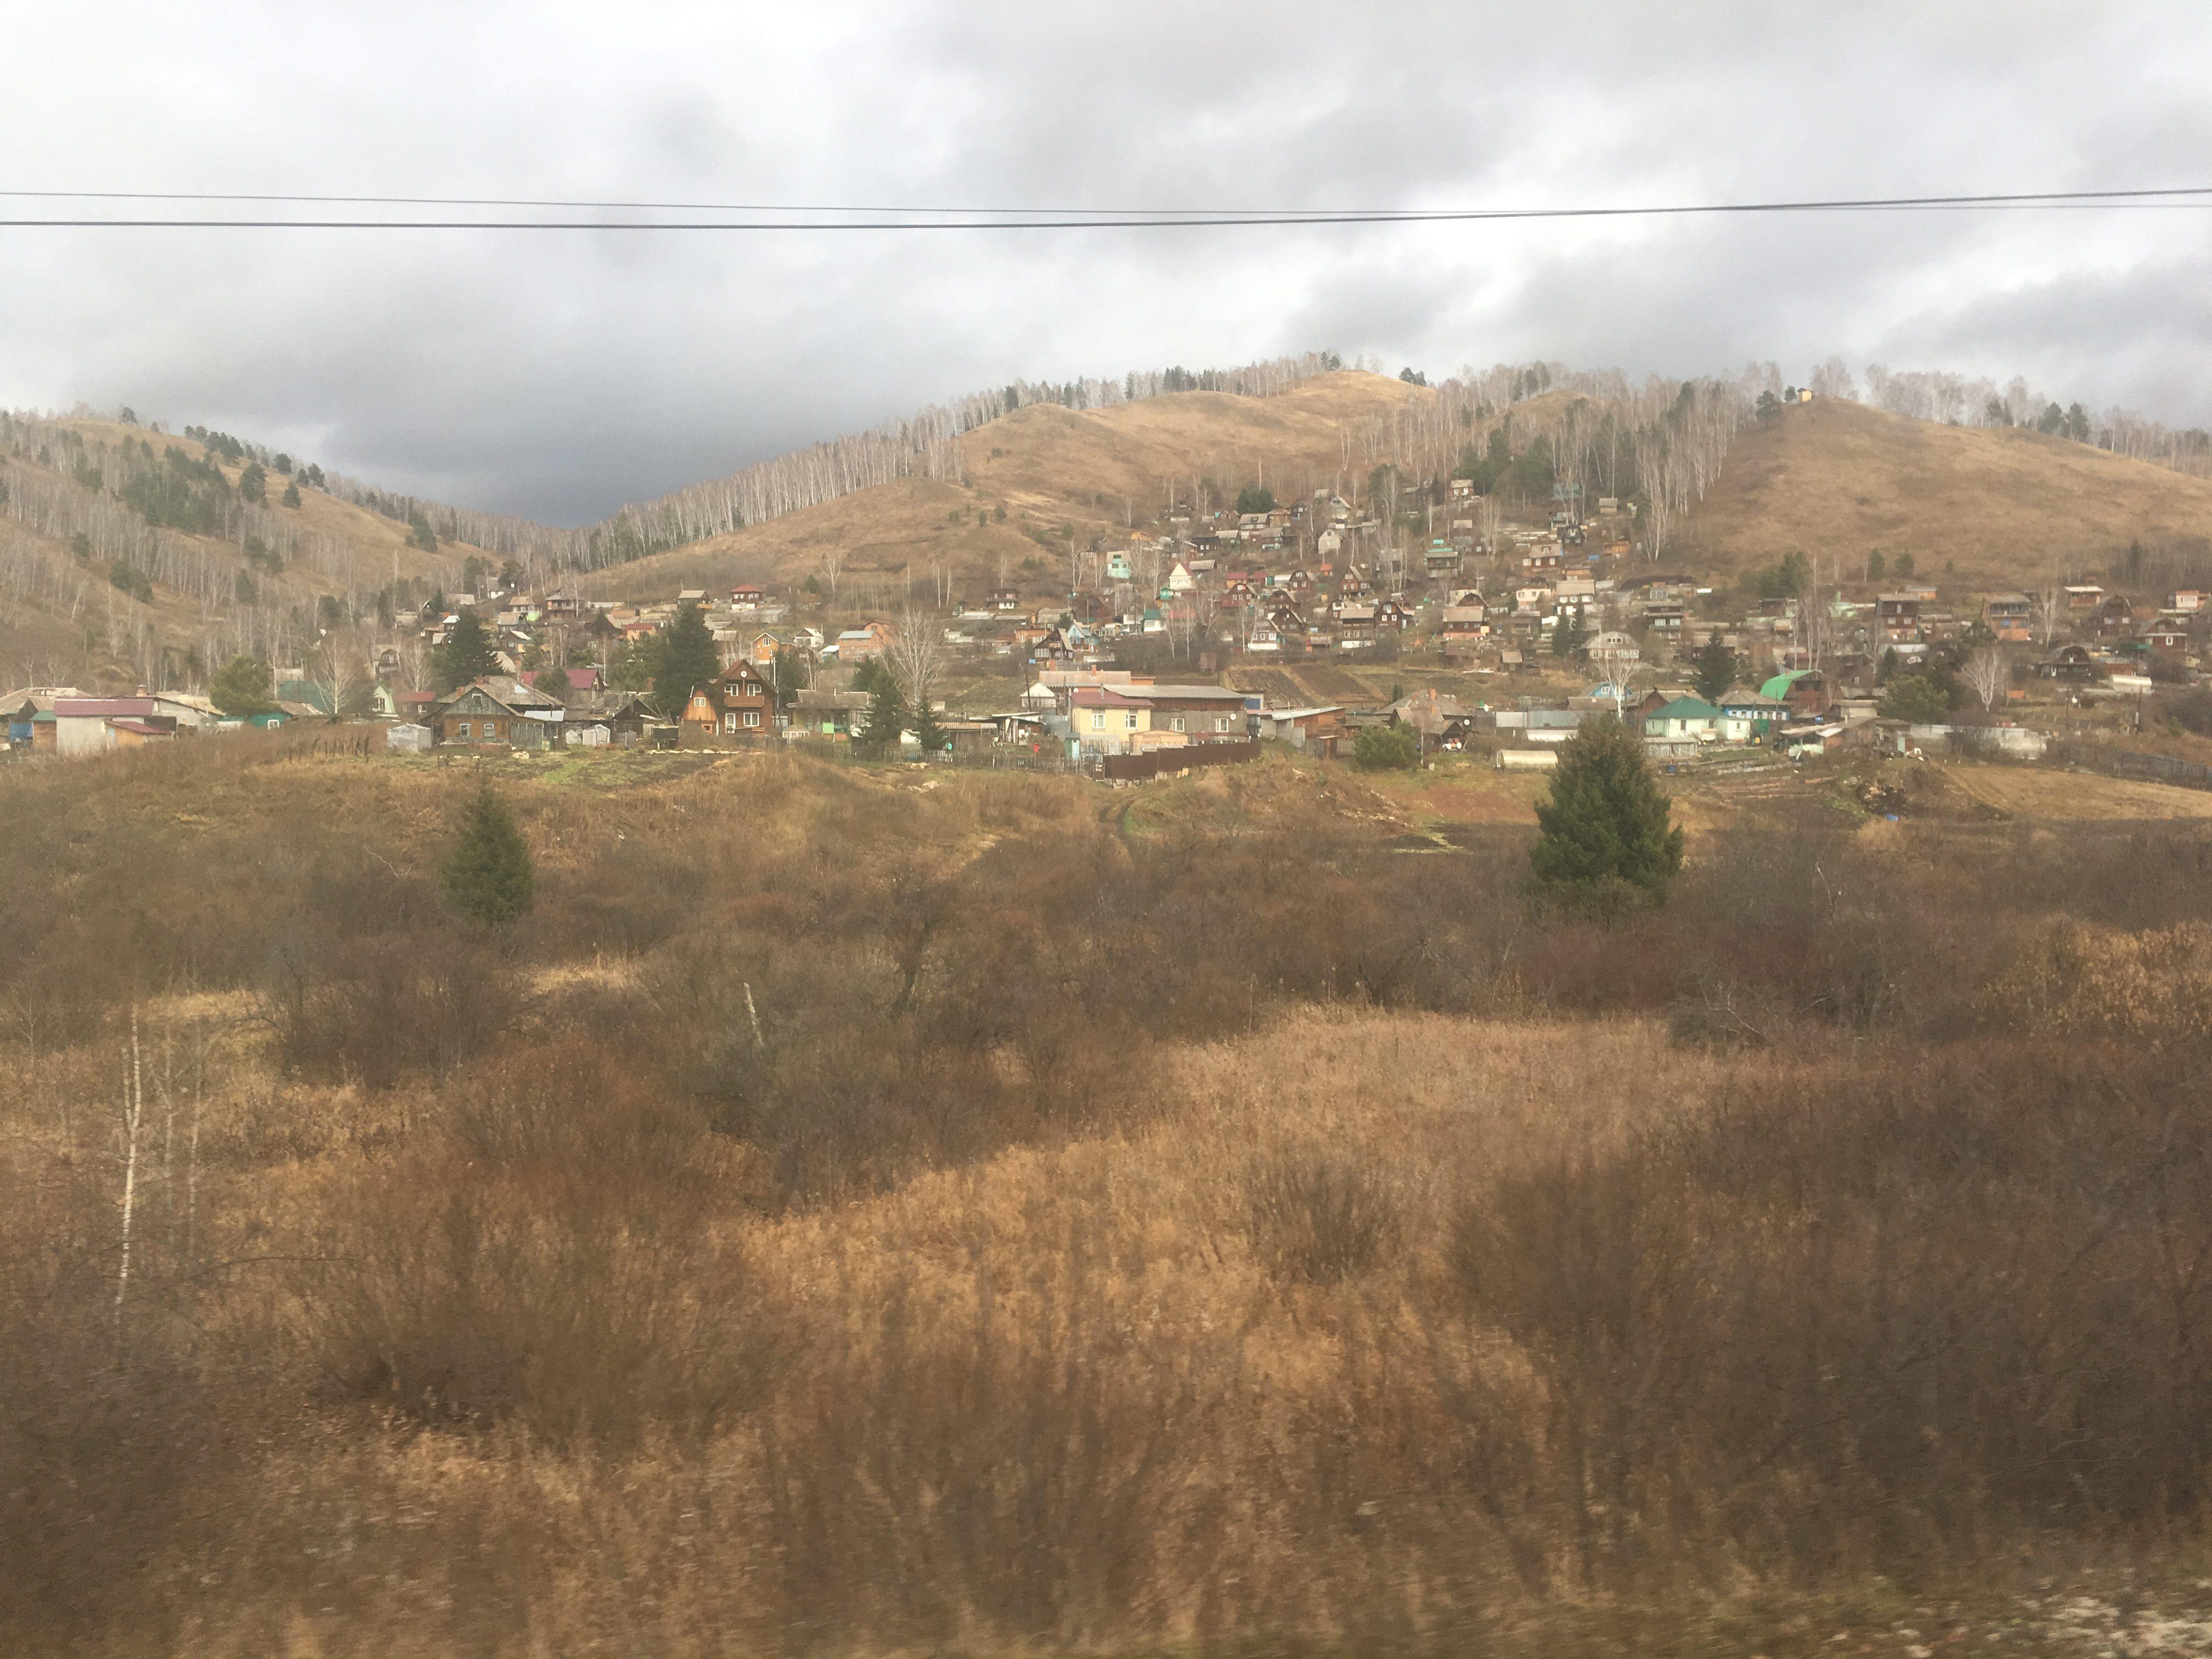 Hills of the Berezovskiy rayon